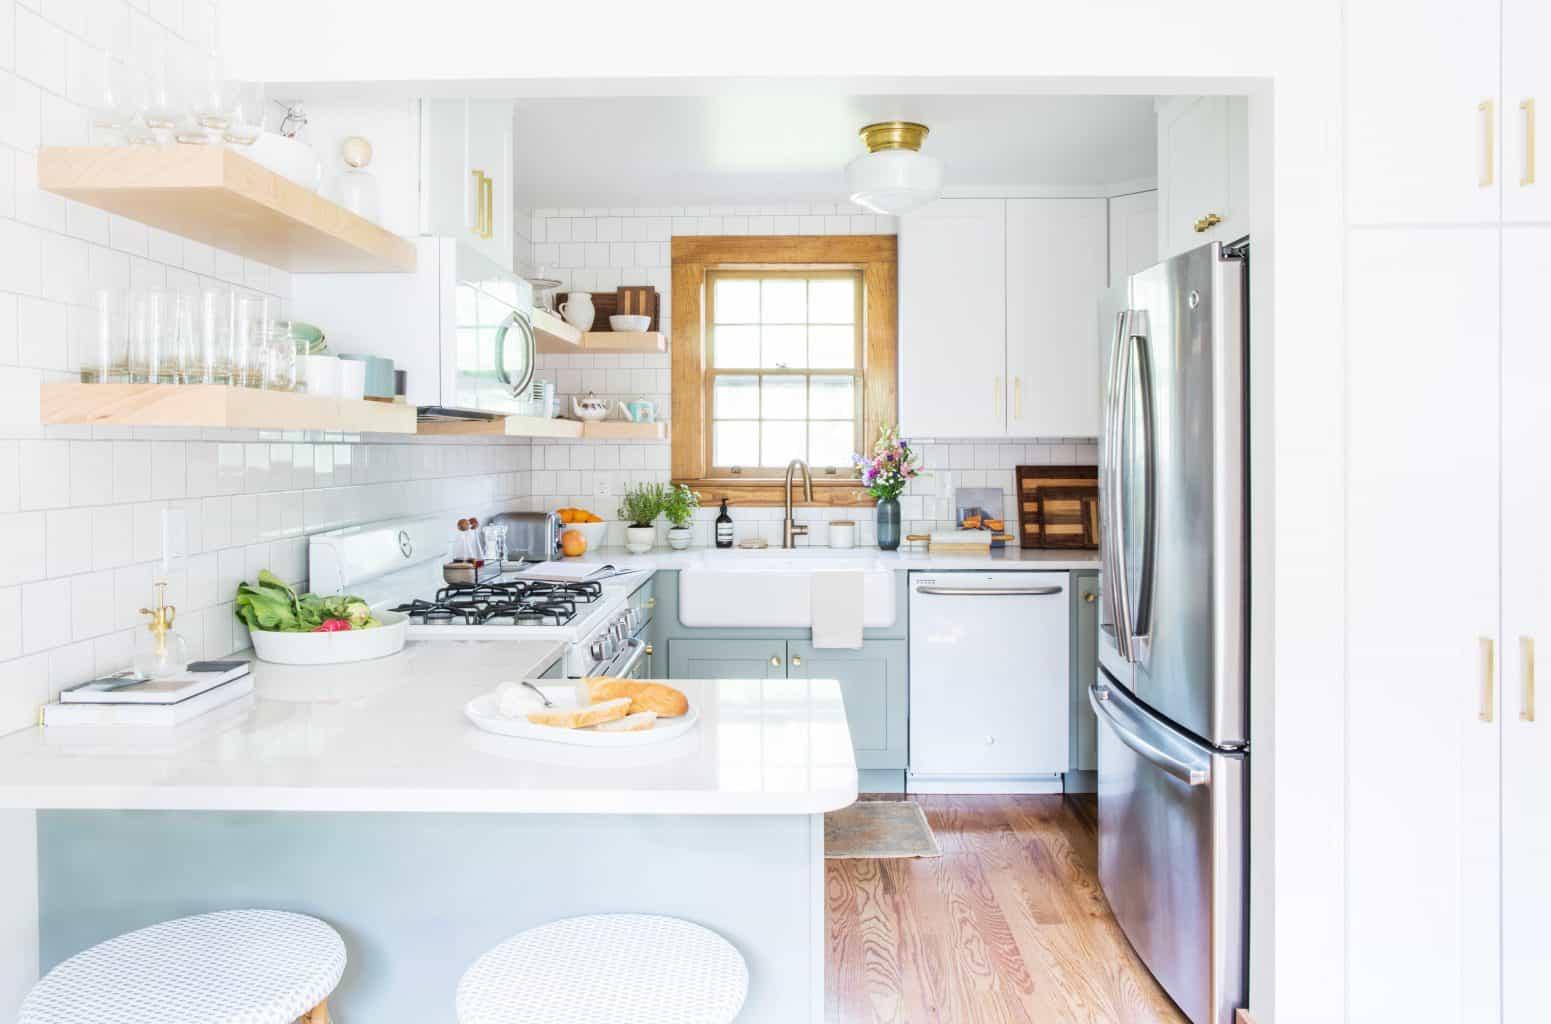 Tennessee Tudor Kitchen | Standard Kitchen and Bath ...